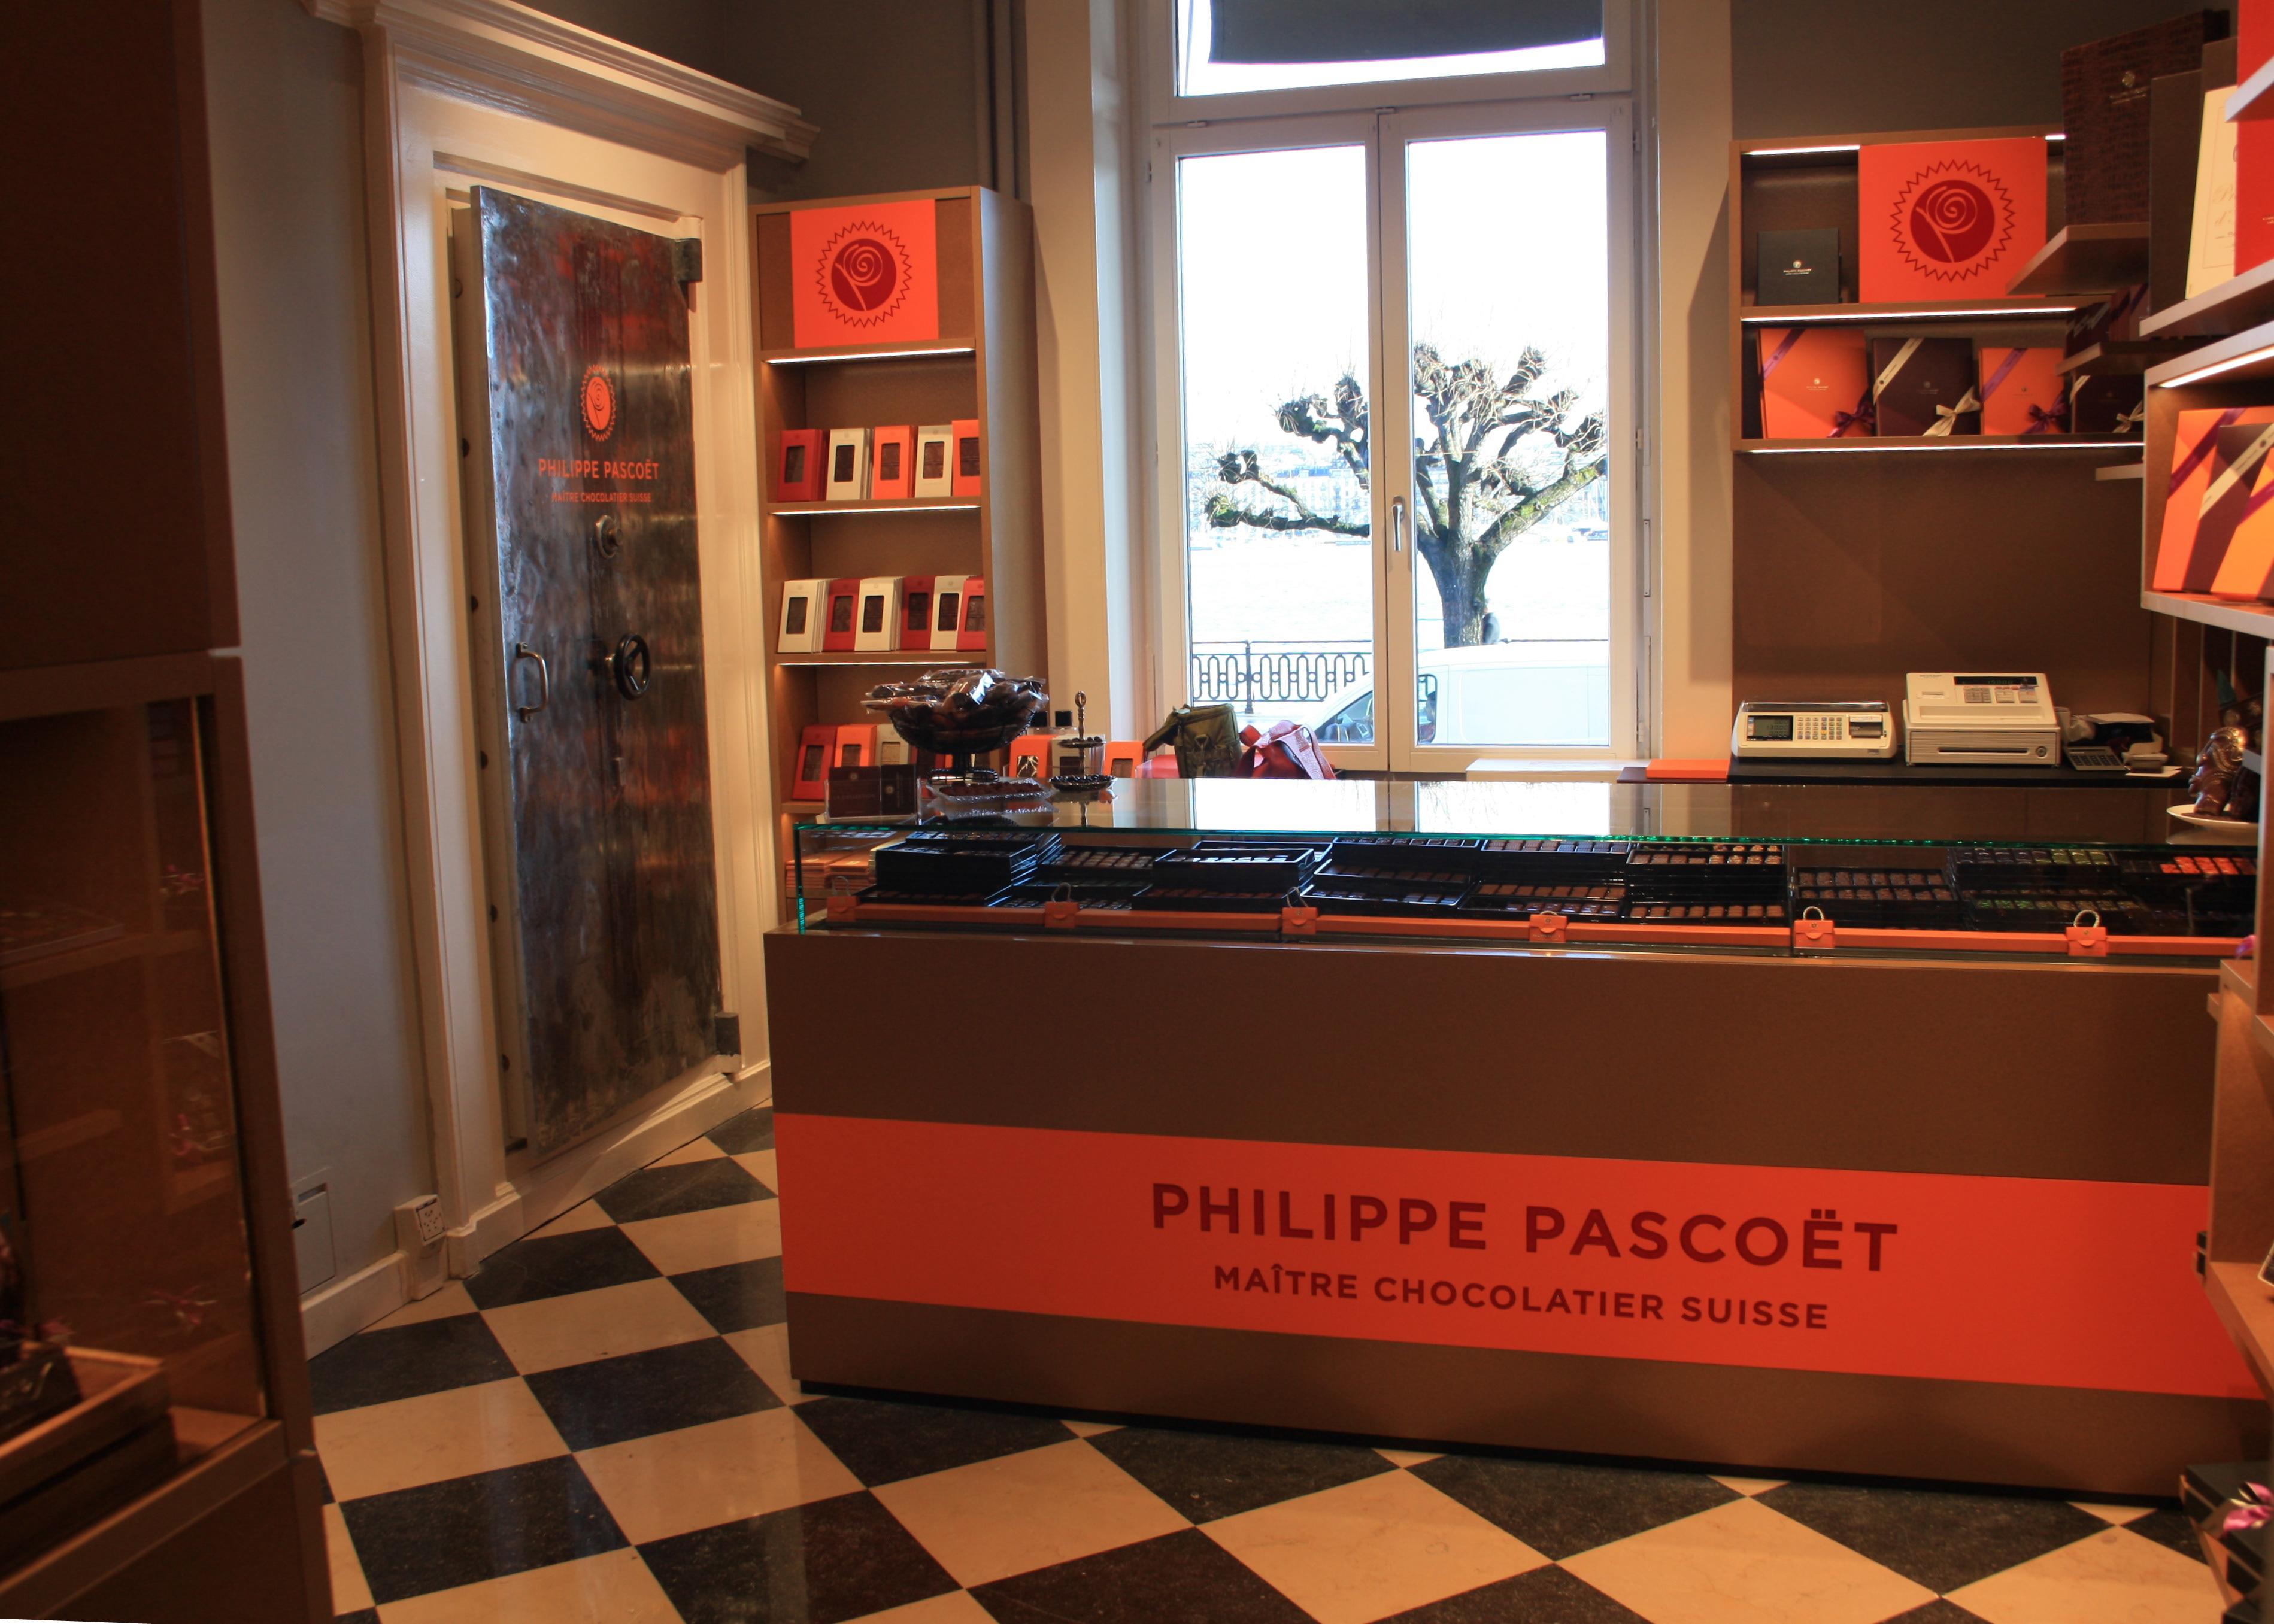 Magma design philippe pascoet hotel de la paix gen ve for Design hotel f 6 genf